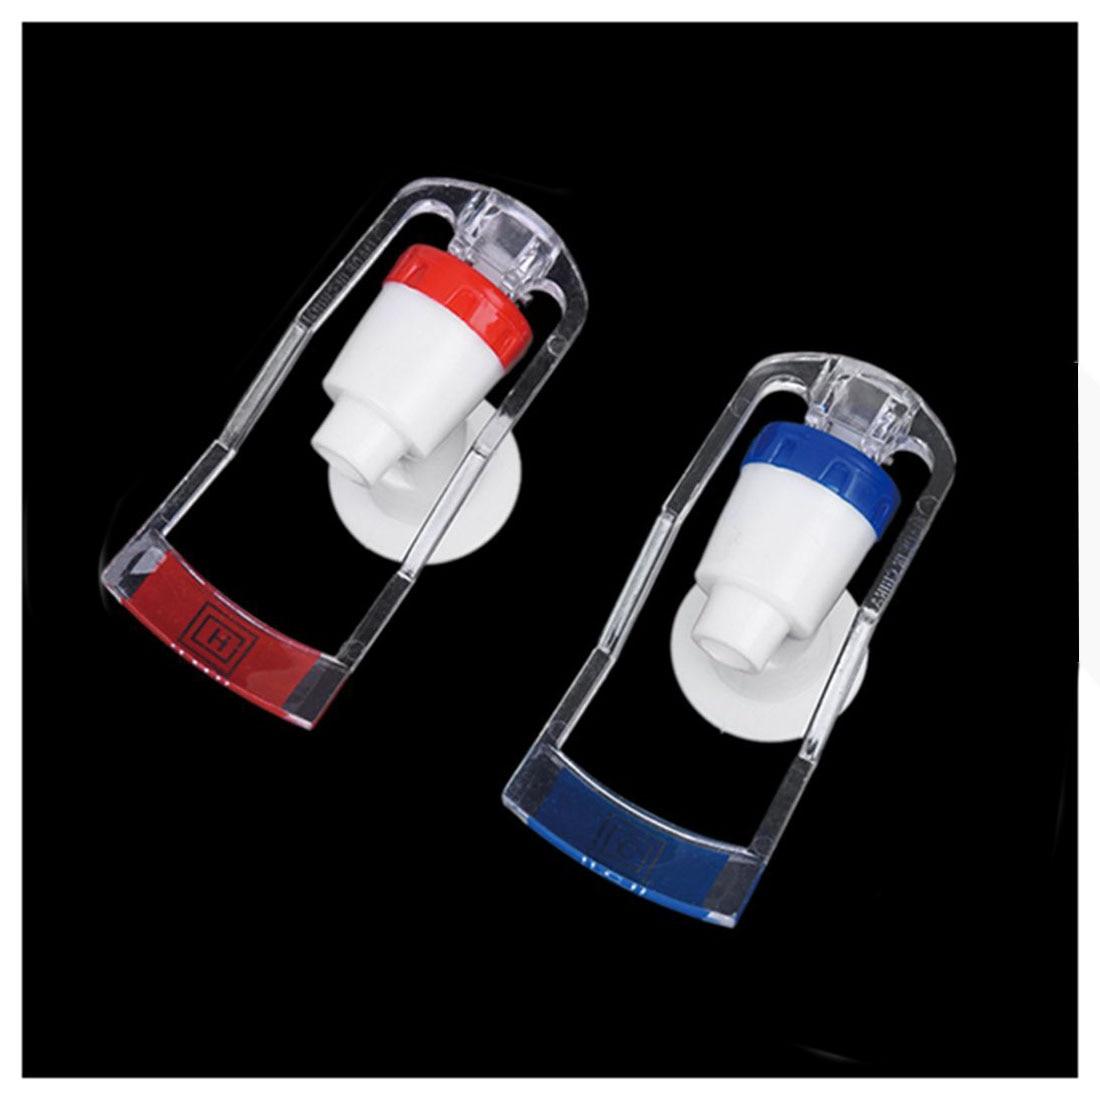 2 шт. 17 мм пластик 45 г Push ручка кран компонент Идеальная замена для диспенсер воды кухня аксессуар